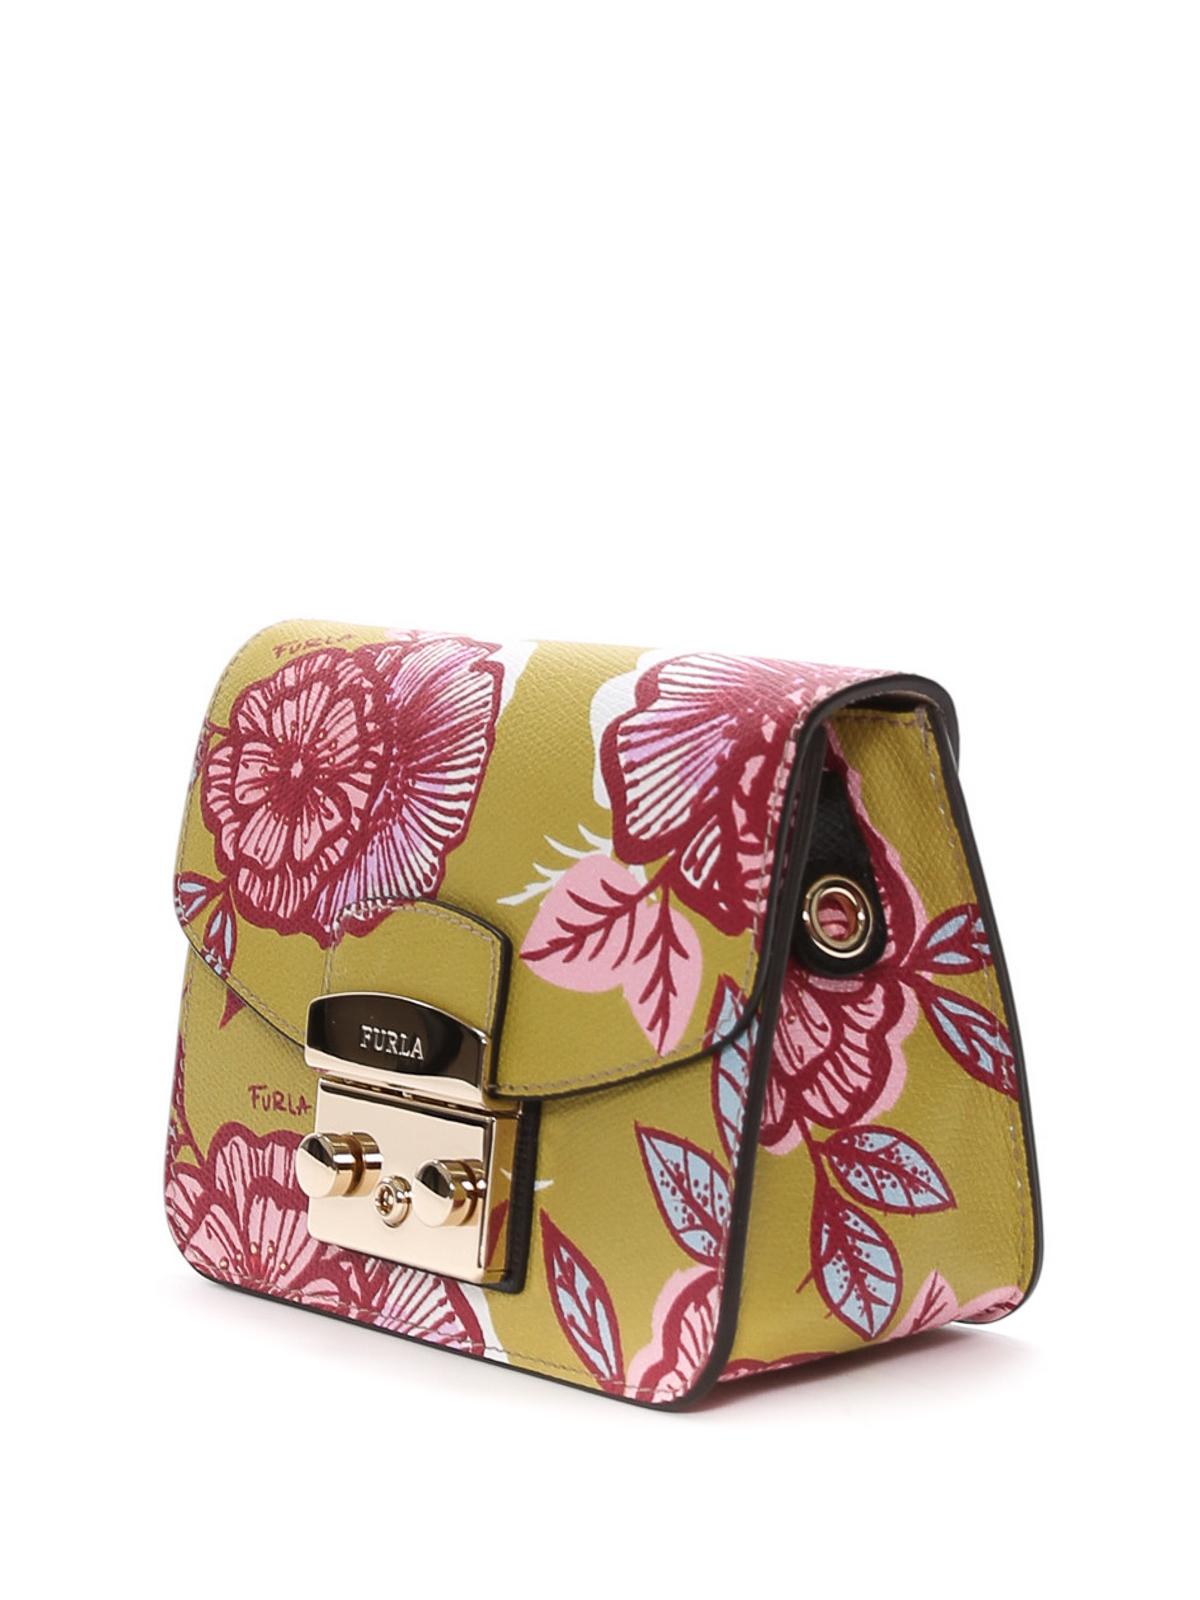 Furla Fl Printed Crossbody Bag Est Price For Jpia5